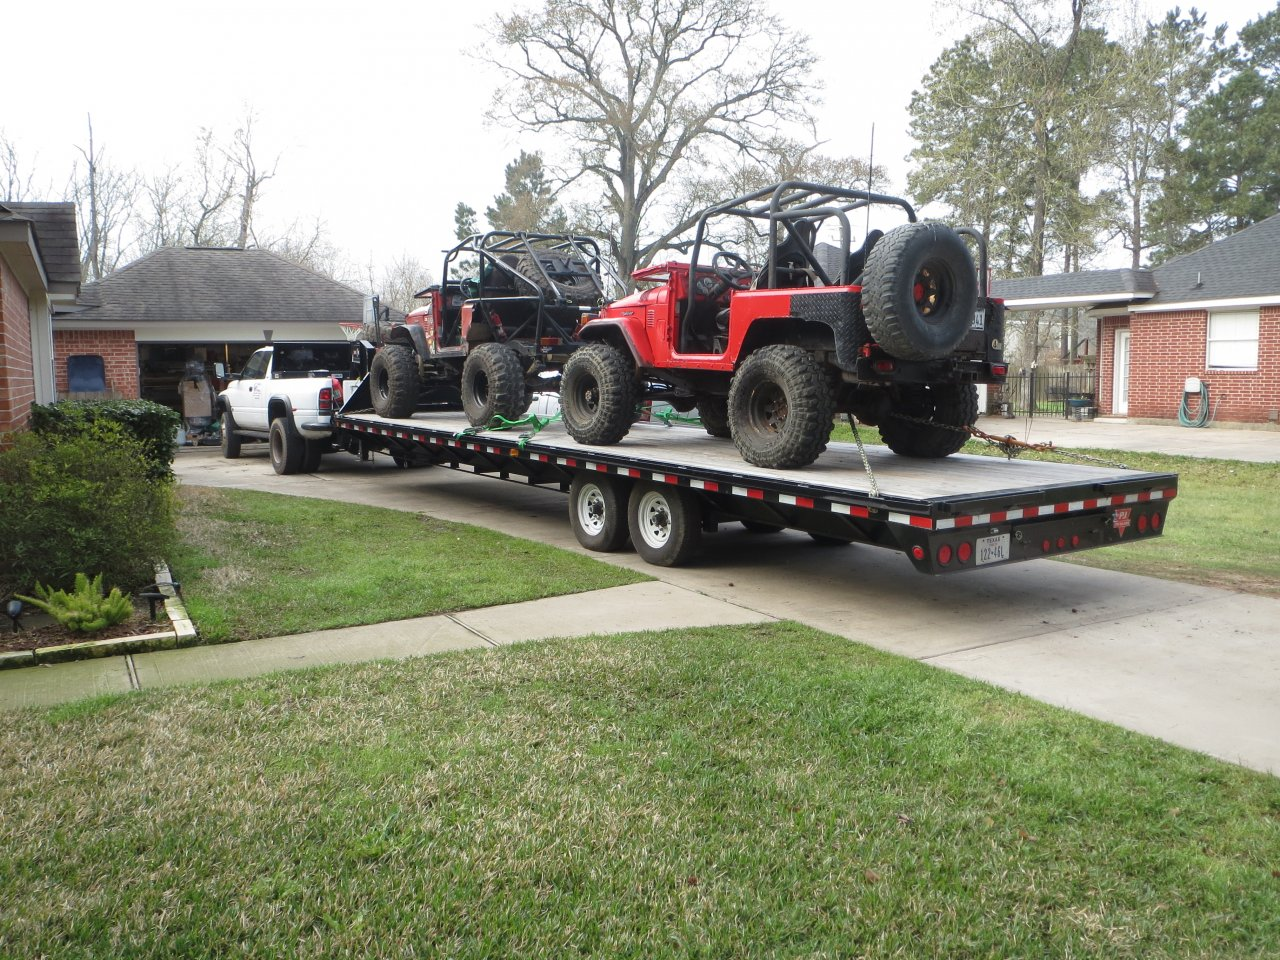 Jeeps For Sale Houston >> For Sale - 32' PJ Gooseneck, 2 yrs. old, Houston, TX | IH8MUD Forum